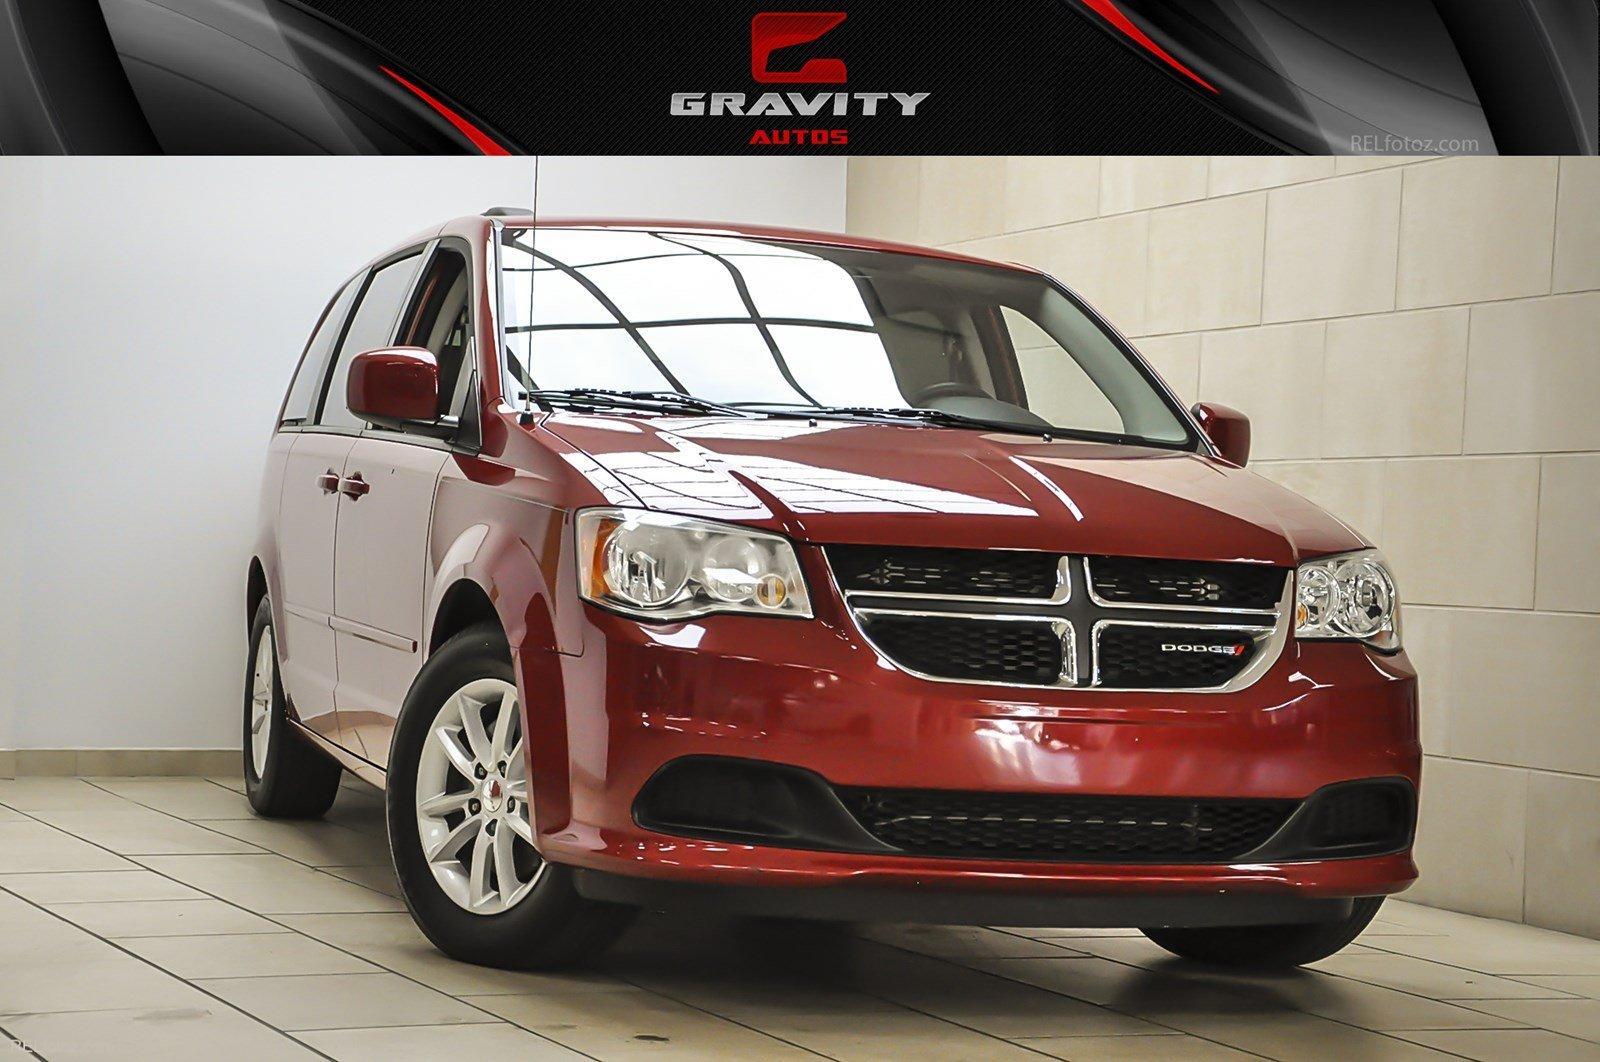 2014 Dodge Grand Caravan Sxt Stock 417364 For Sale Near Sandy Used Springs Ga